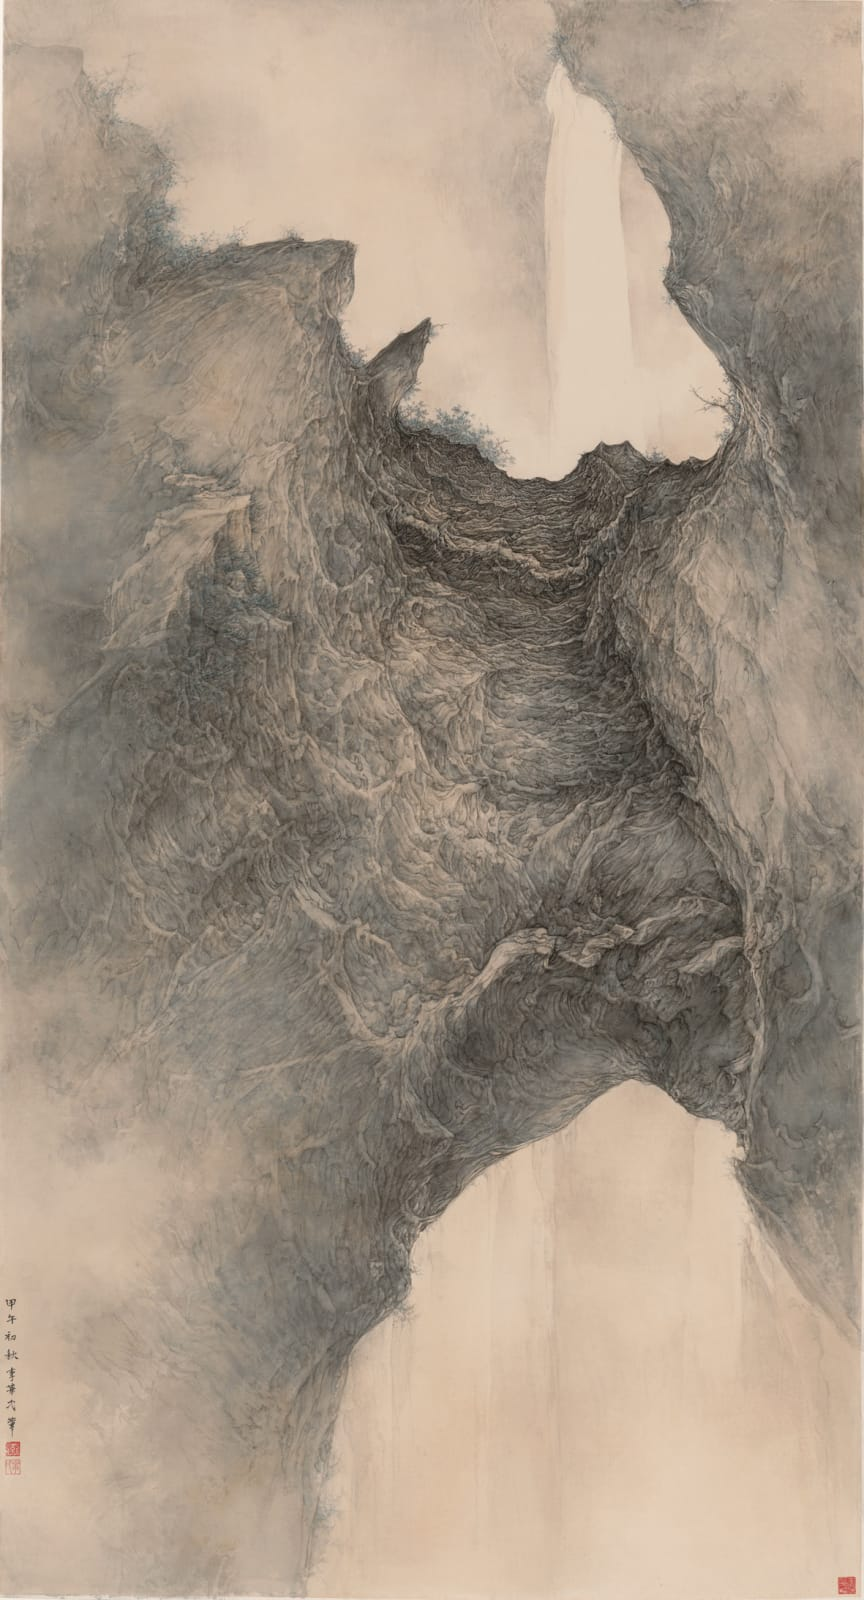 Li Huayi 李華弌, Untitled《無題》, 2014